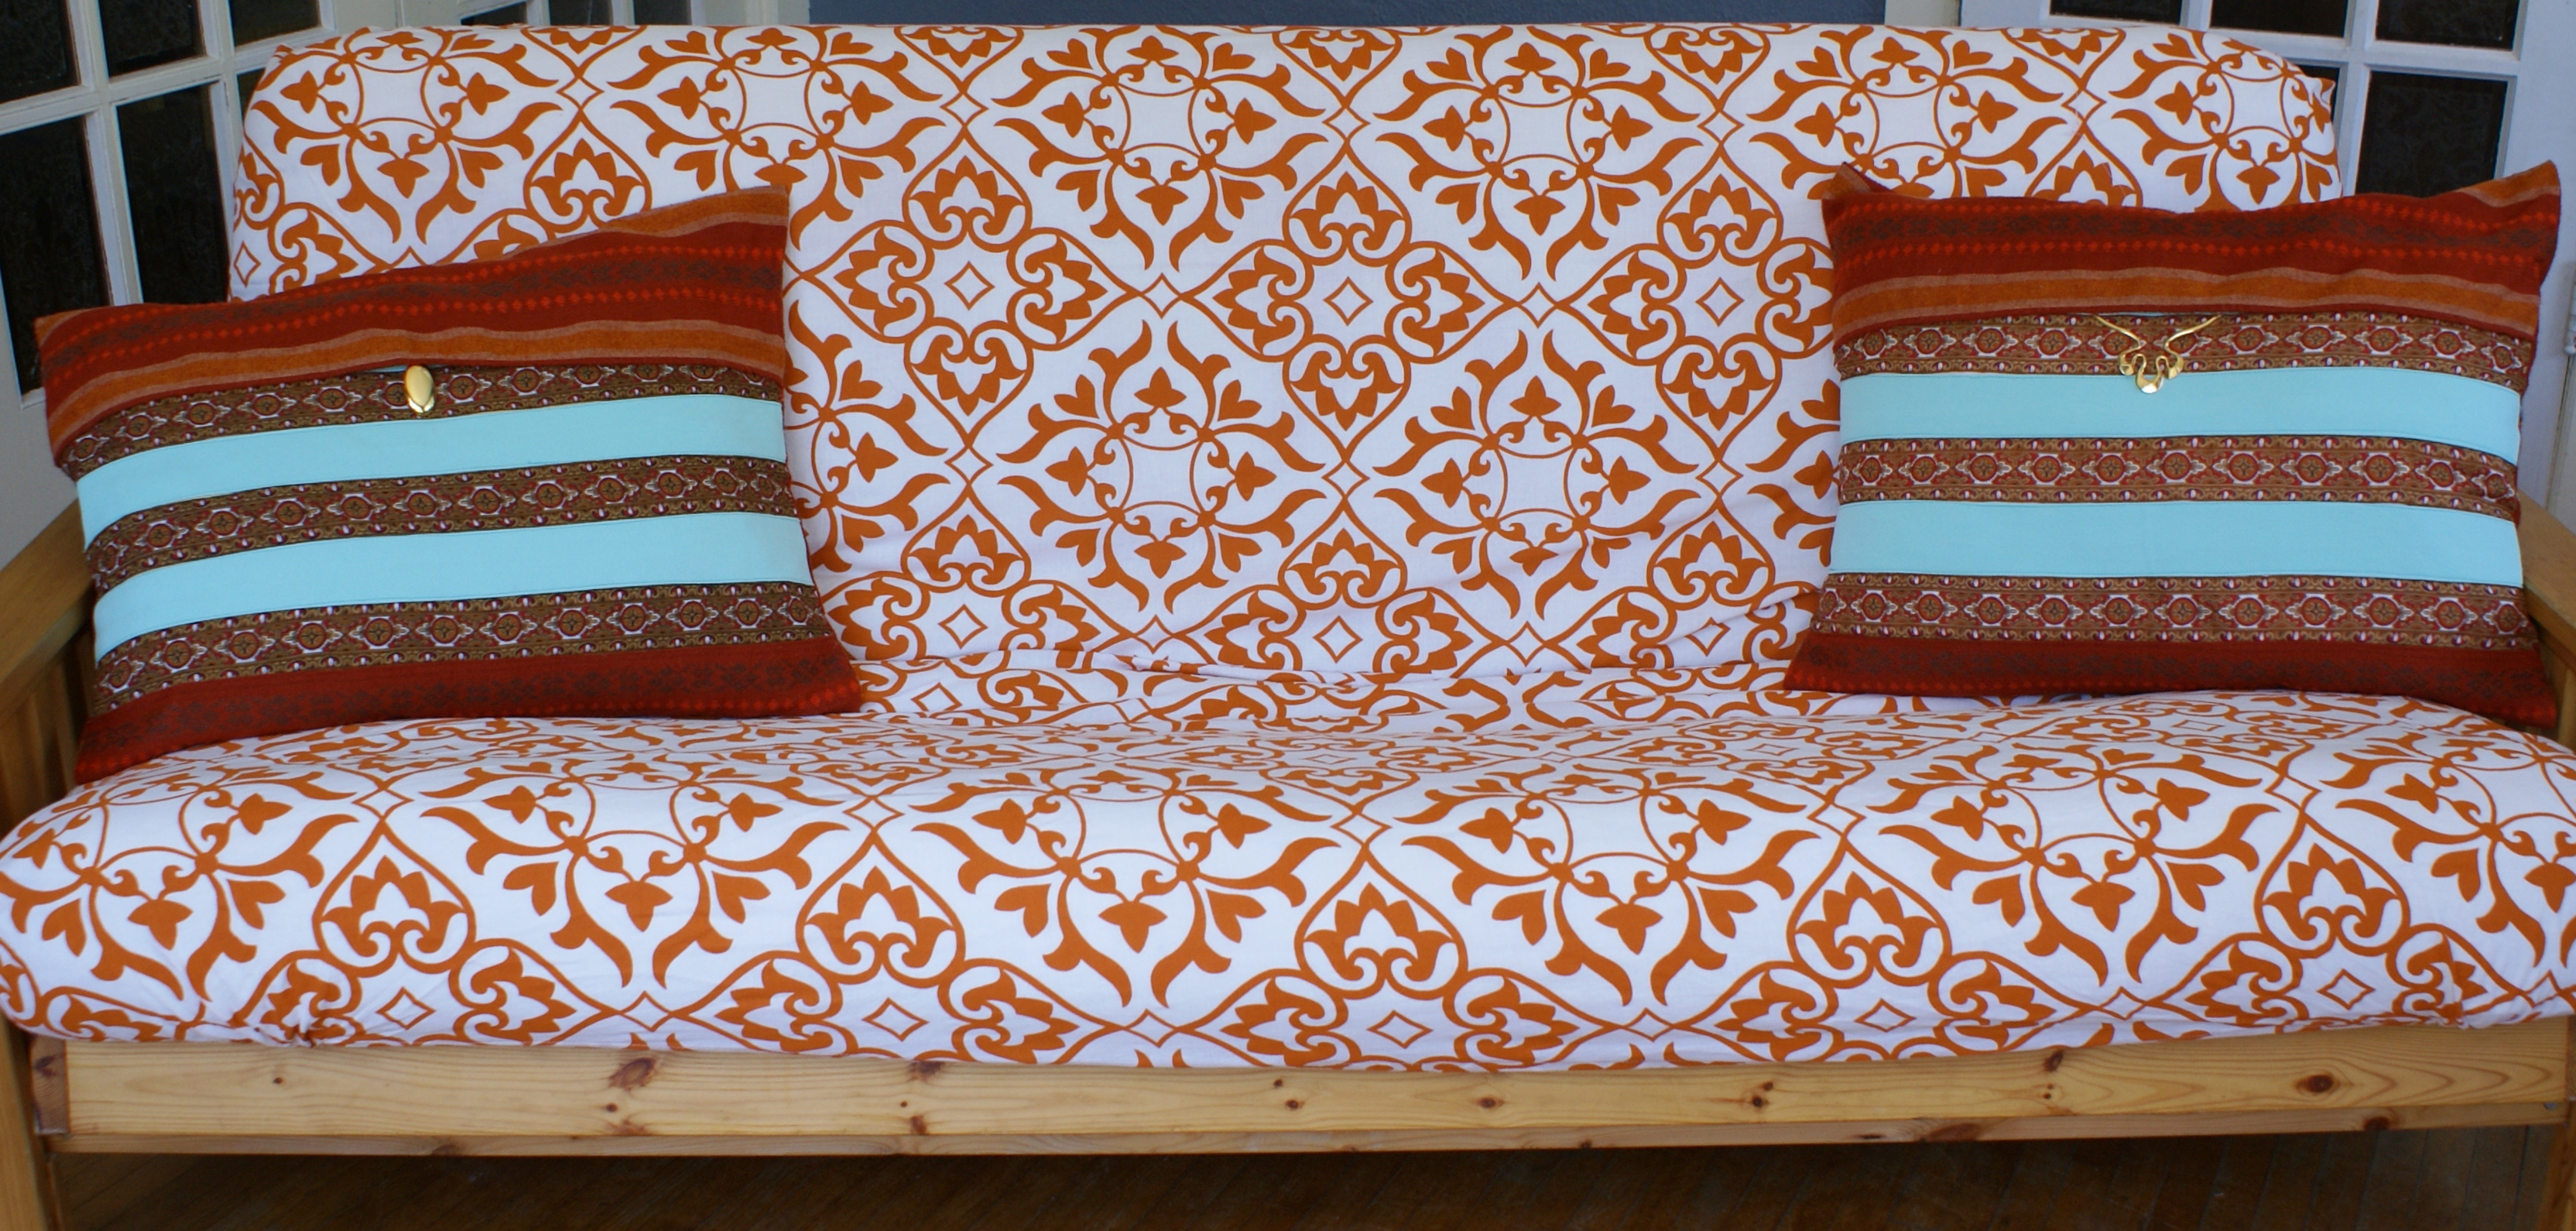 Woodwork Make Diy Futon Cover Pdf Plans